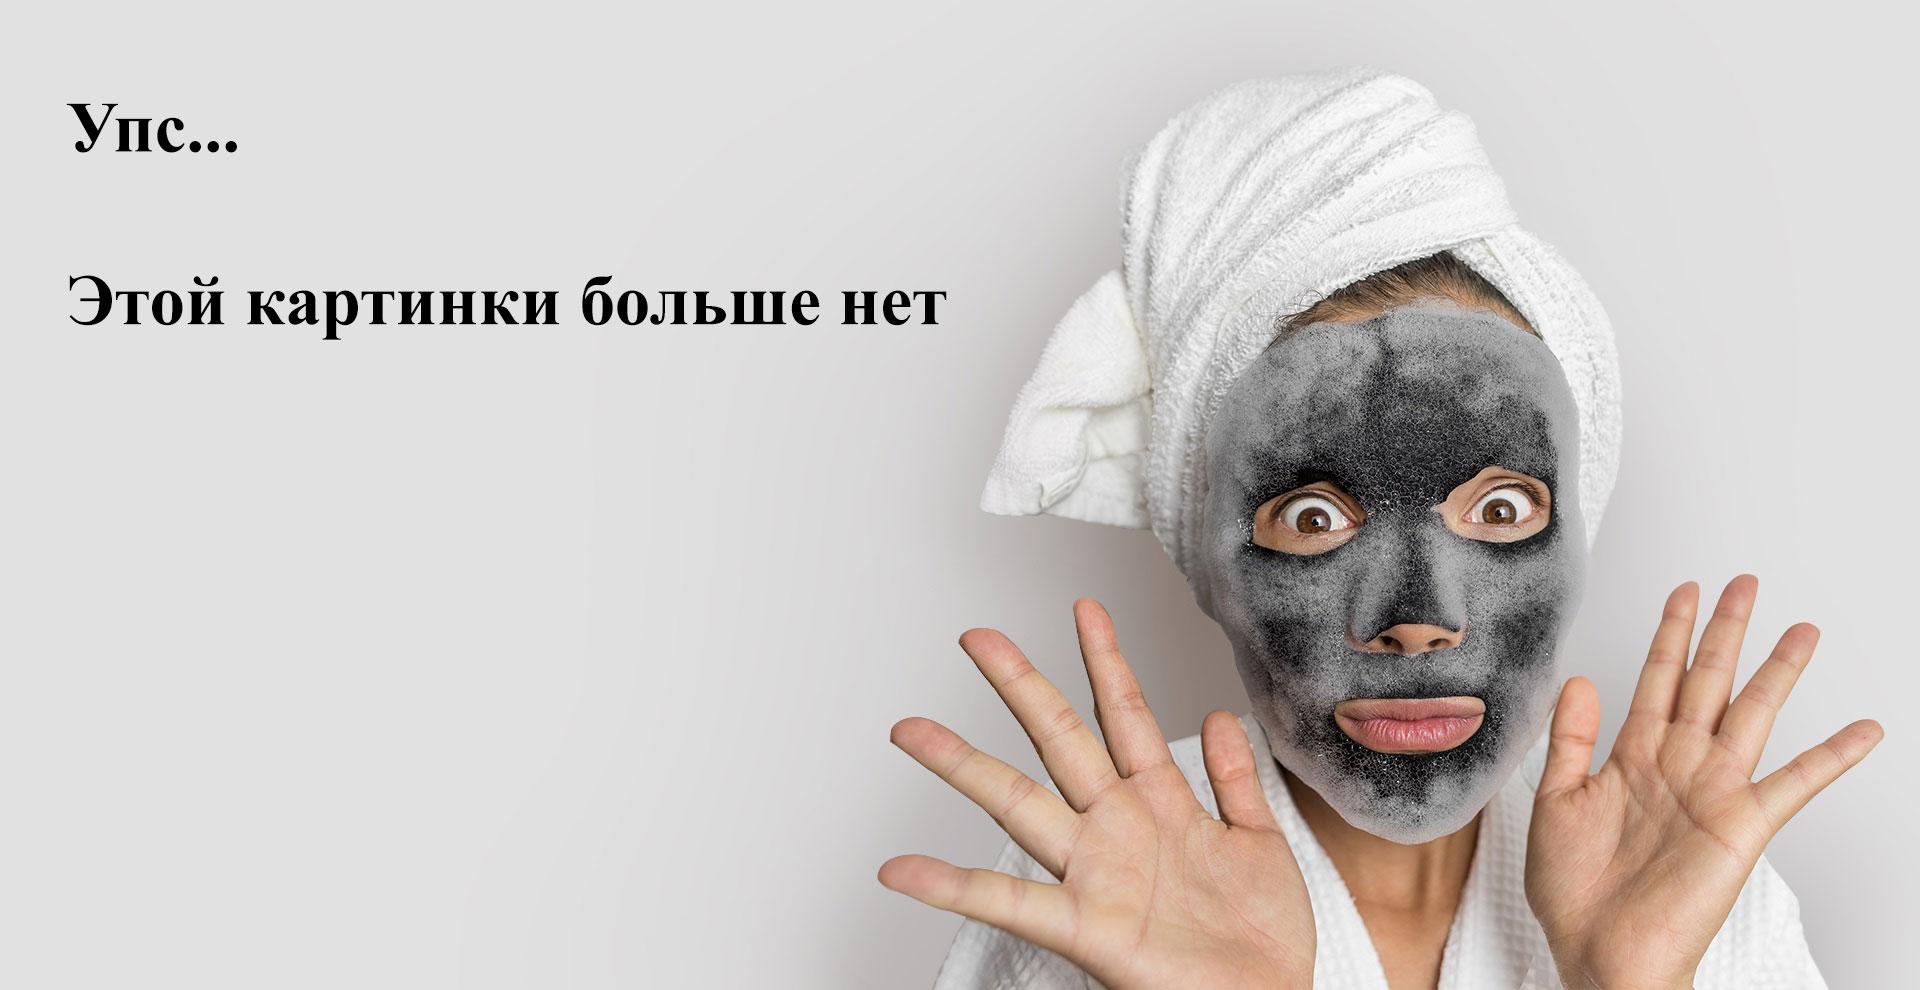 Patrisa Nail, Гель-лак «Стиль жизни» №441